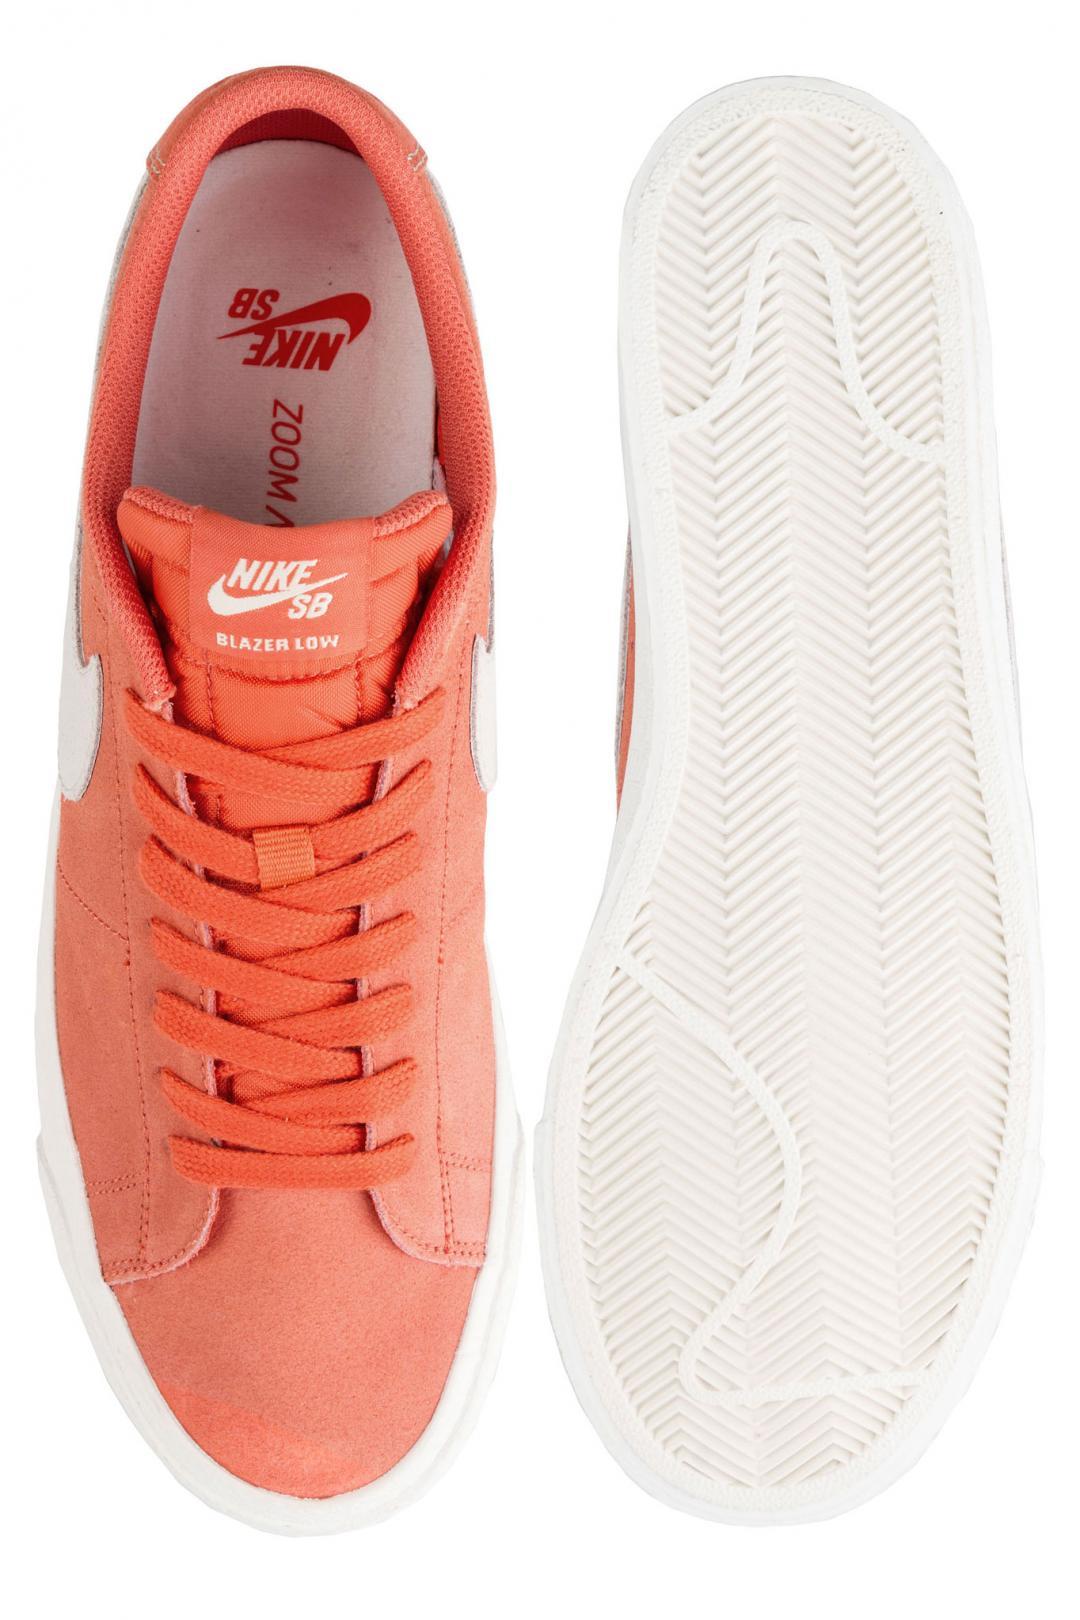 Uomo Nike SB Zoom Blazer Low vintage coral fossil sail | Sneakers low top